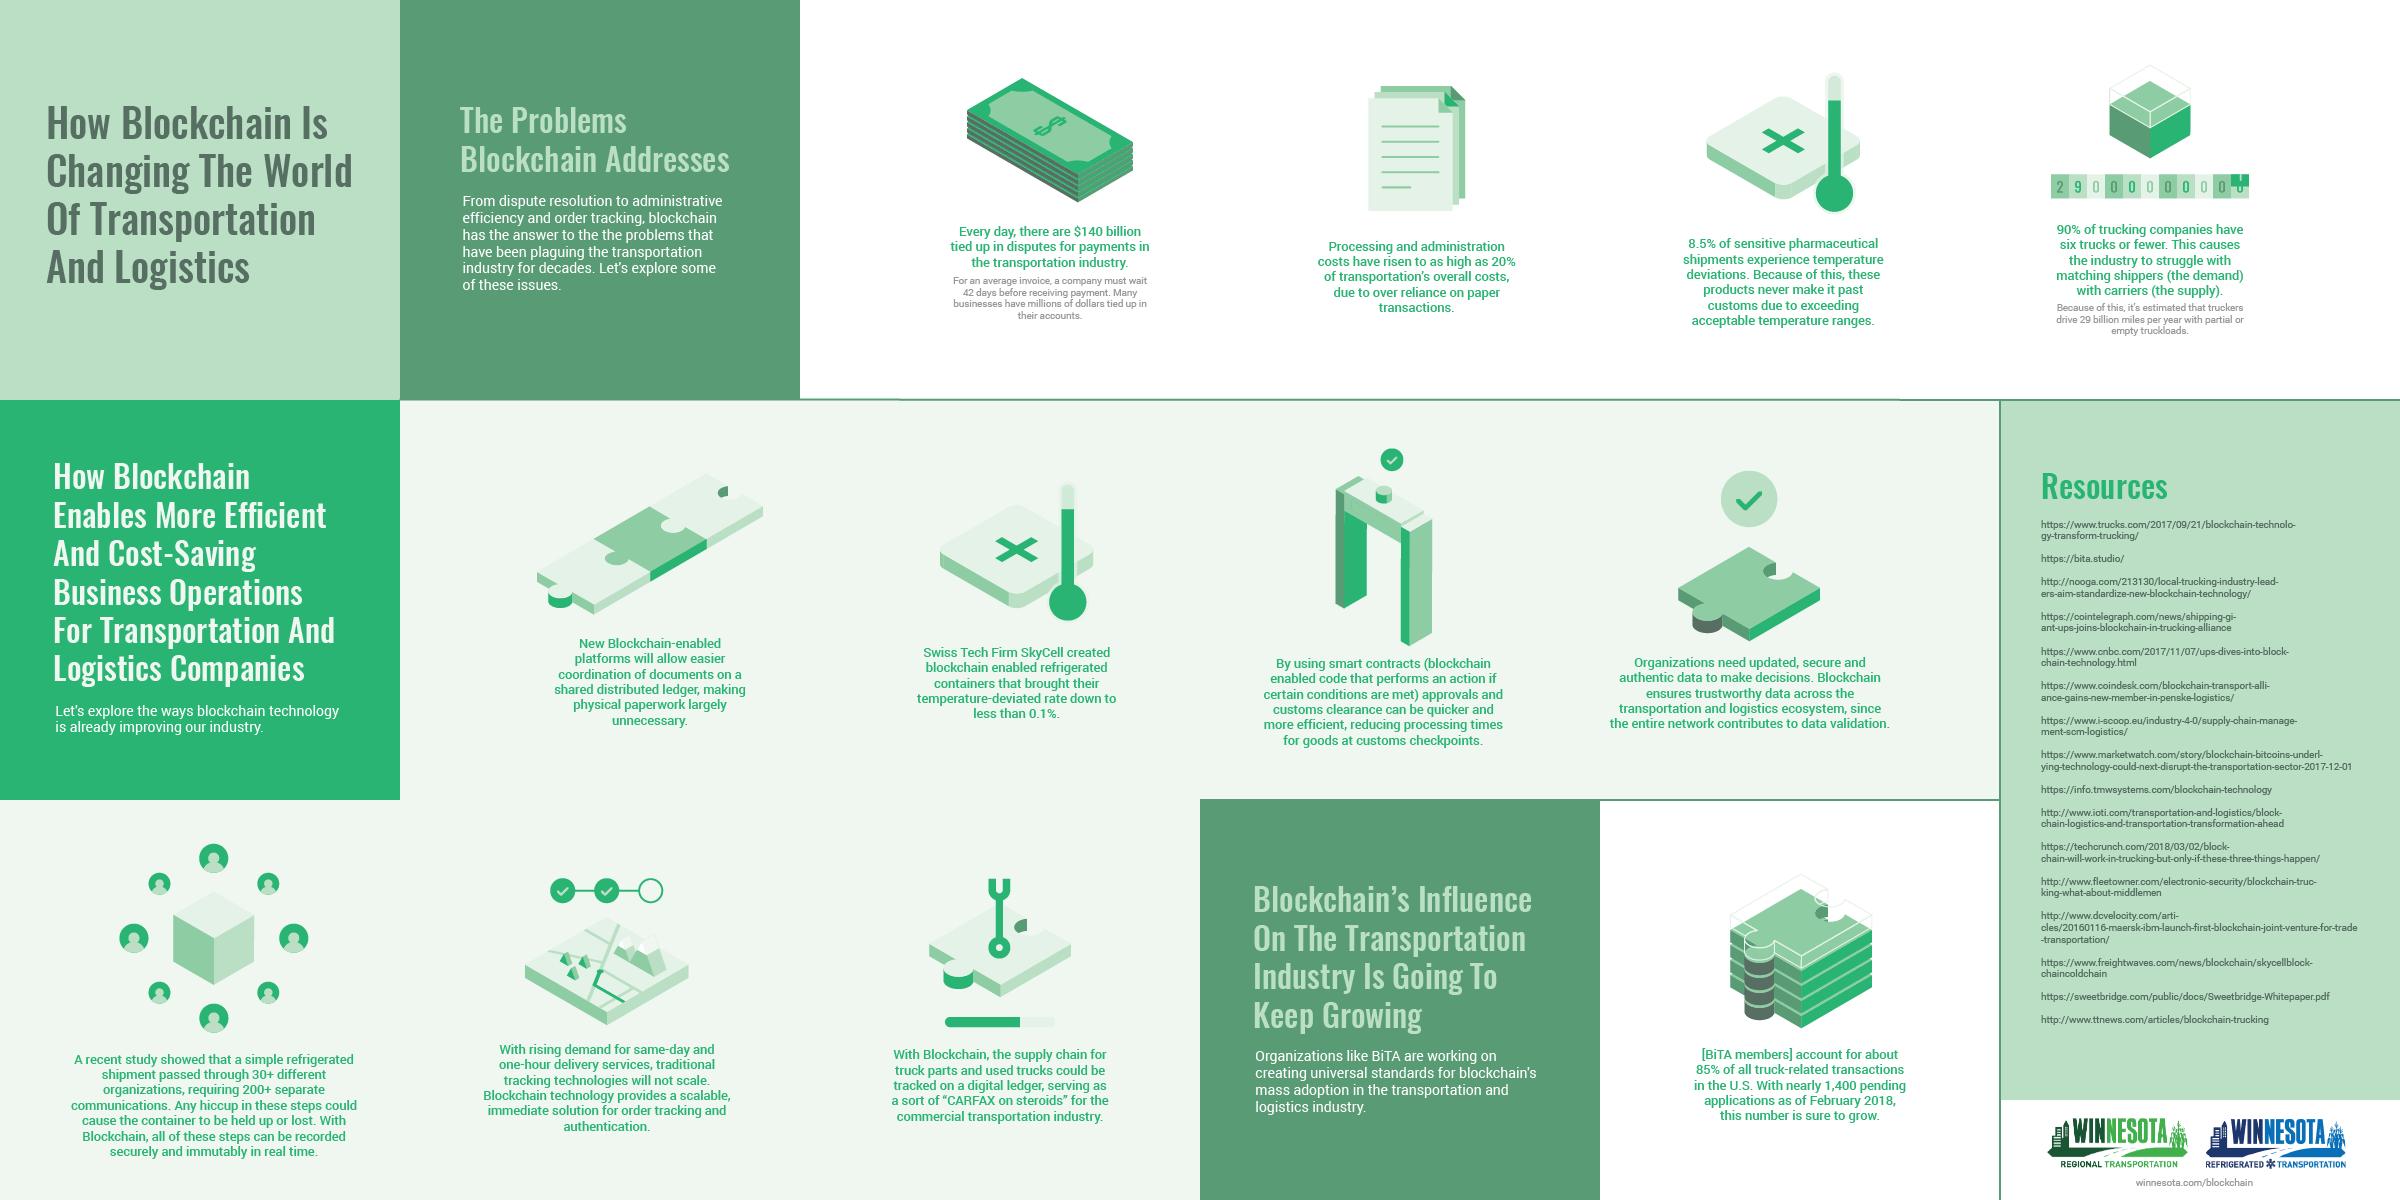 Technology Management Image: 8 Ways Blockchain Is Revolutionizing Transportation And